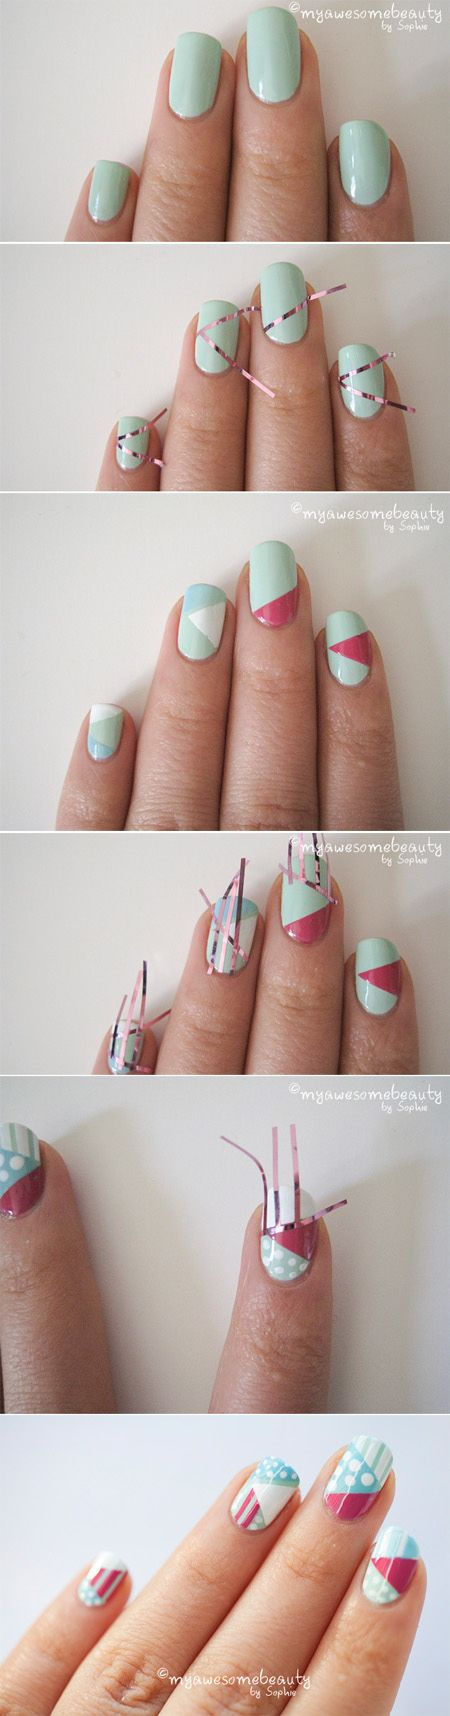 12 Amazing Diy Nail Art Designs Using Scotch Tape 16